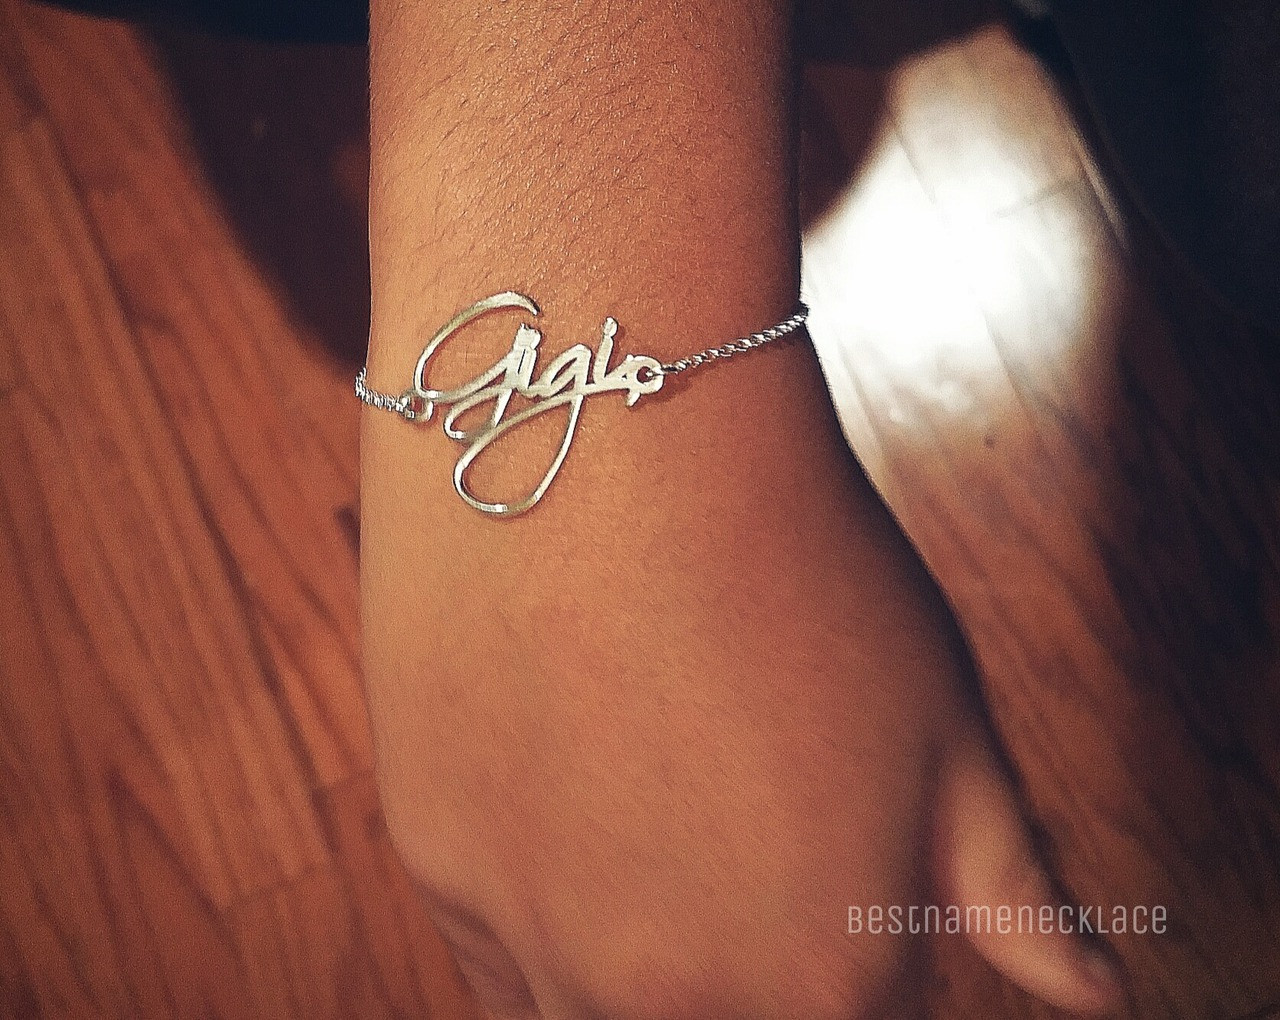 b911e31167e3f Free Hand Personalized Name Bracelet